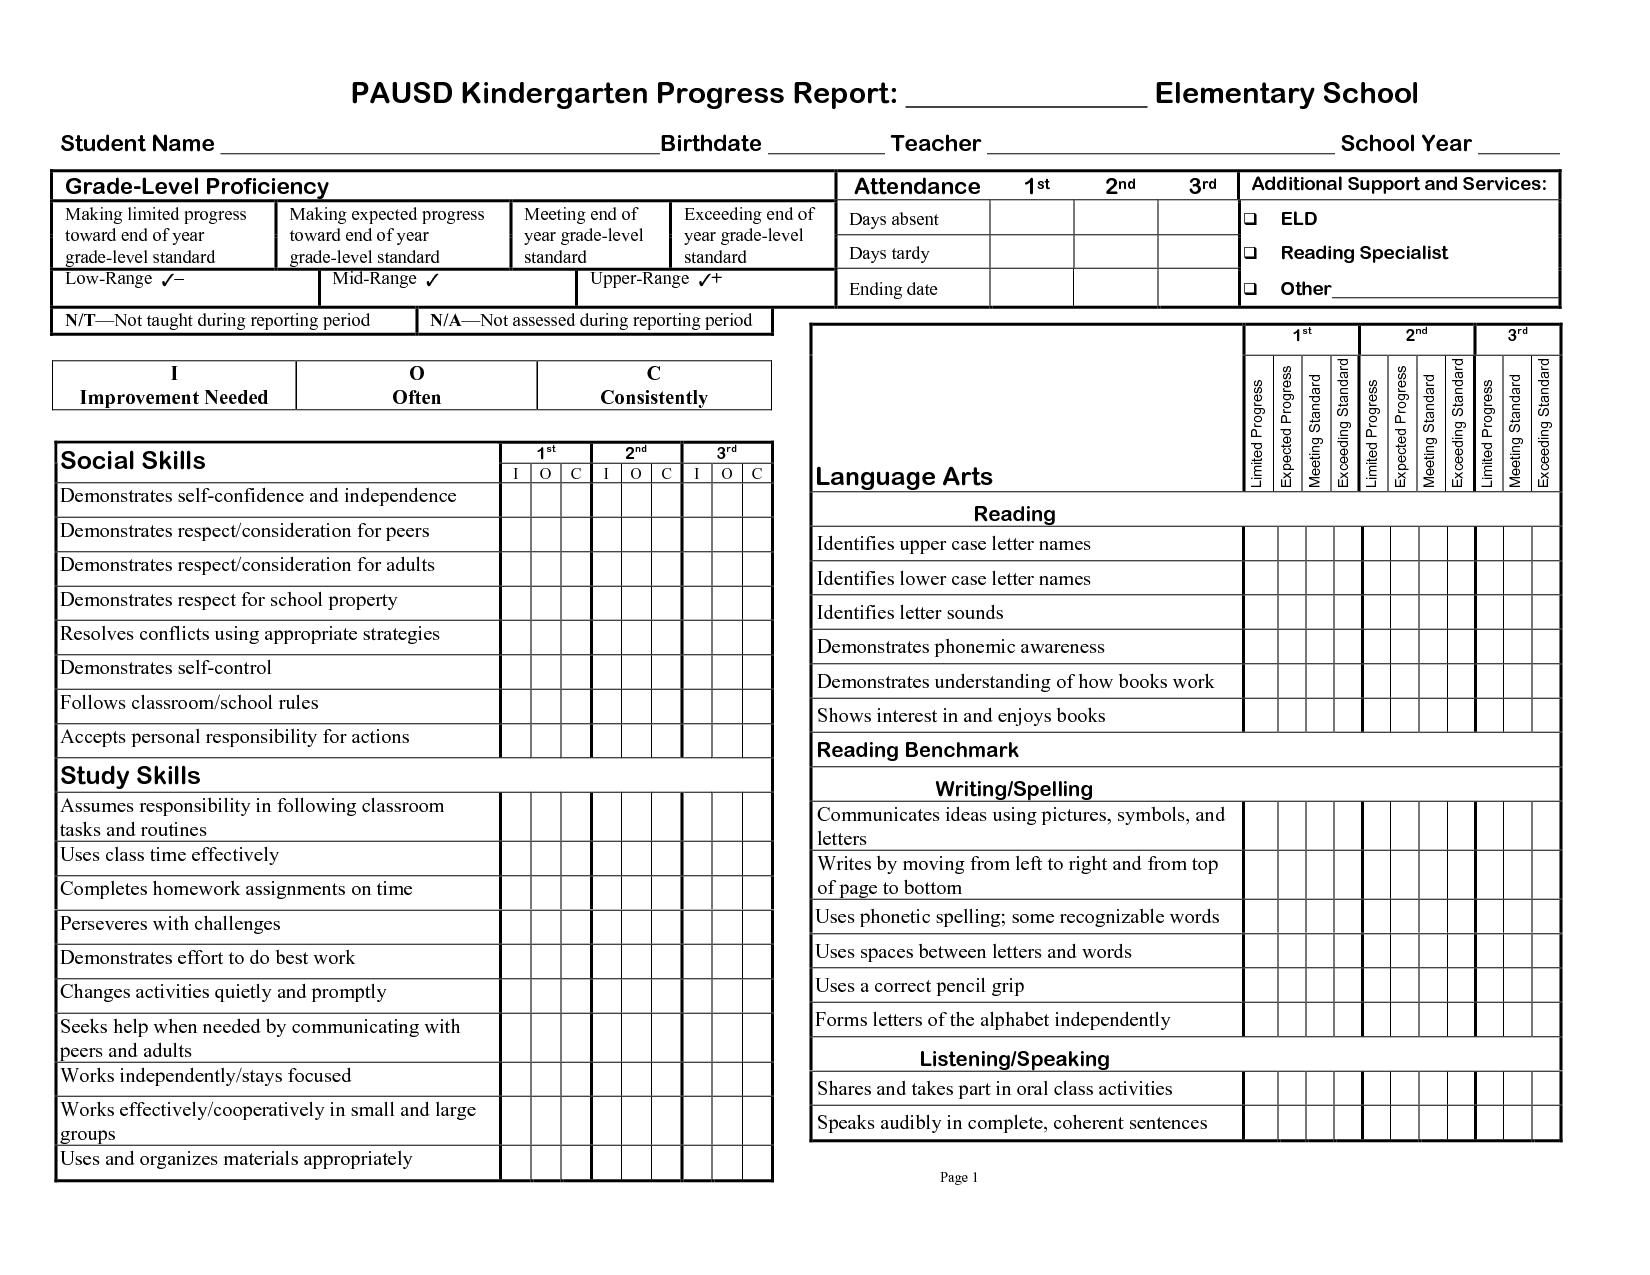 Kindergarten Social Skills Progress Report Blank Templates in Printable Social Skills Fill In The Blanks